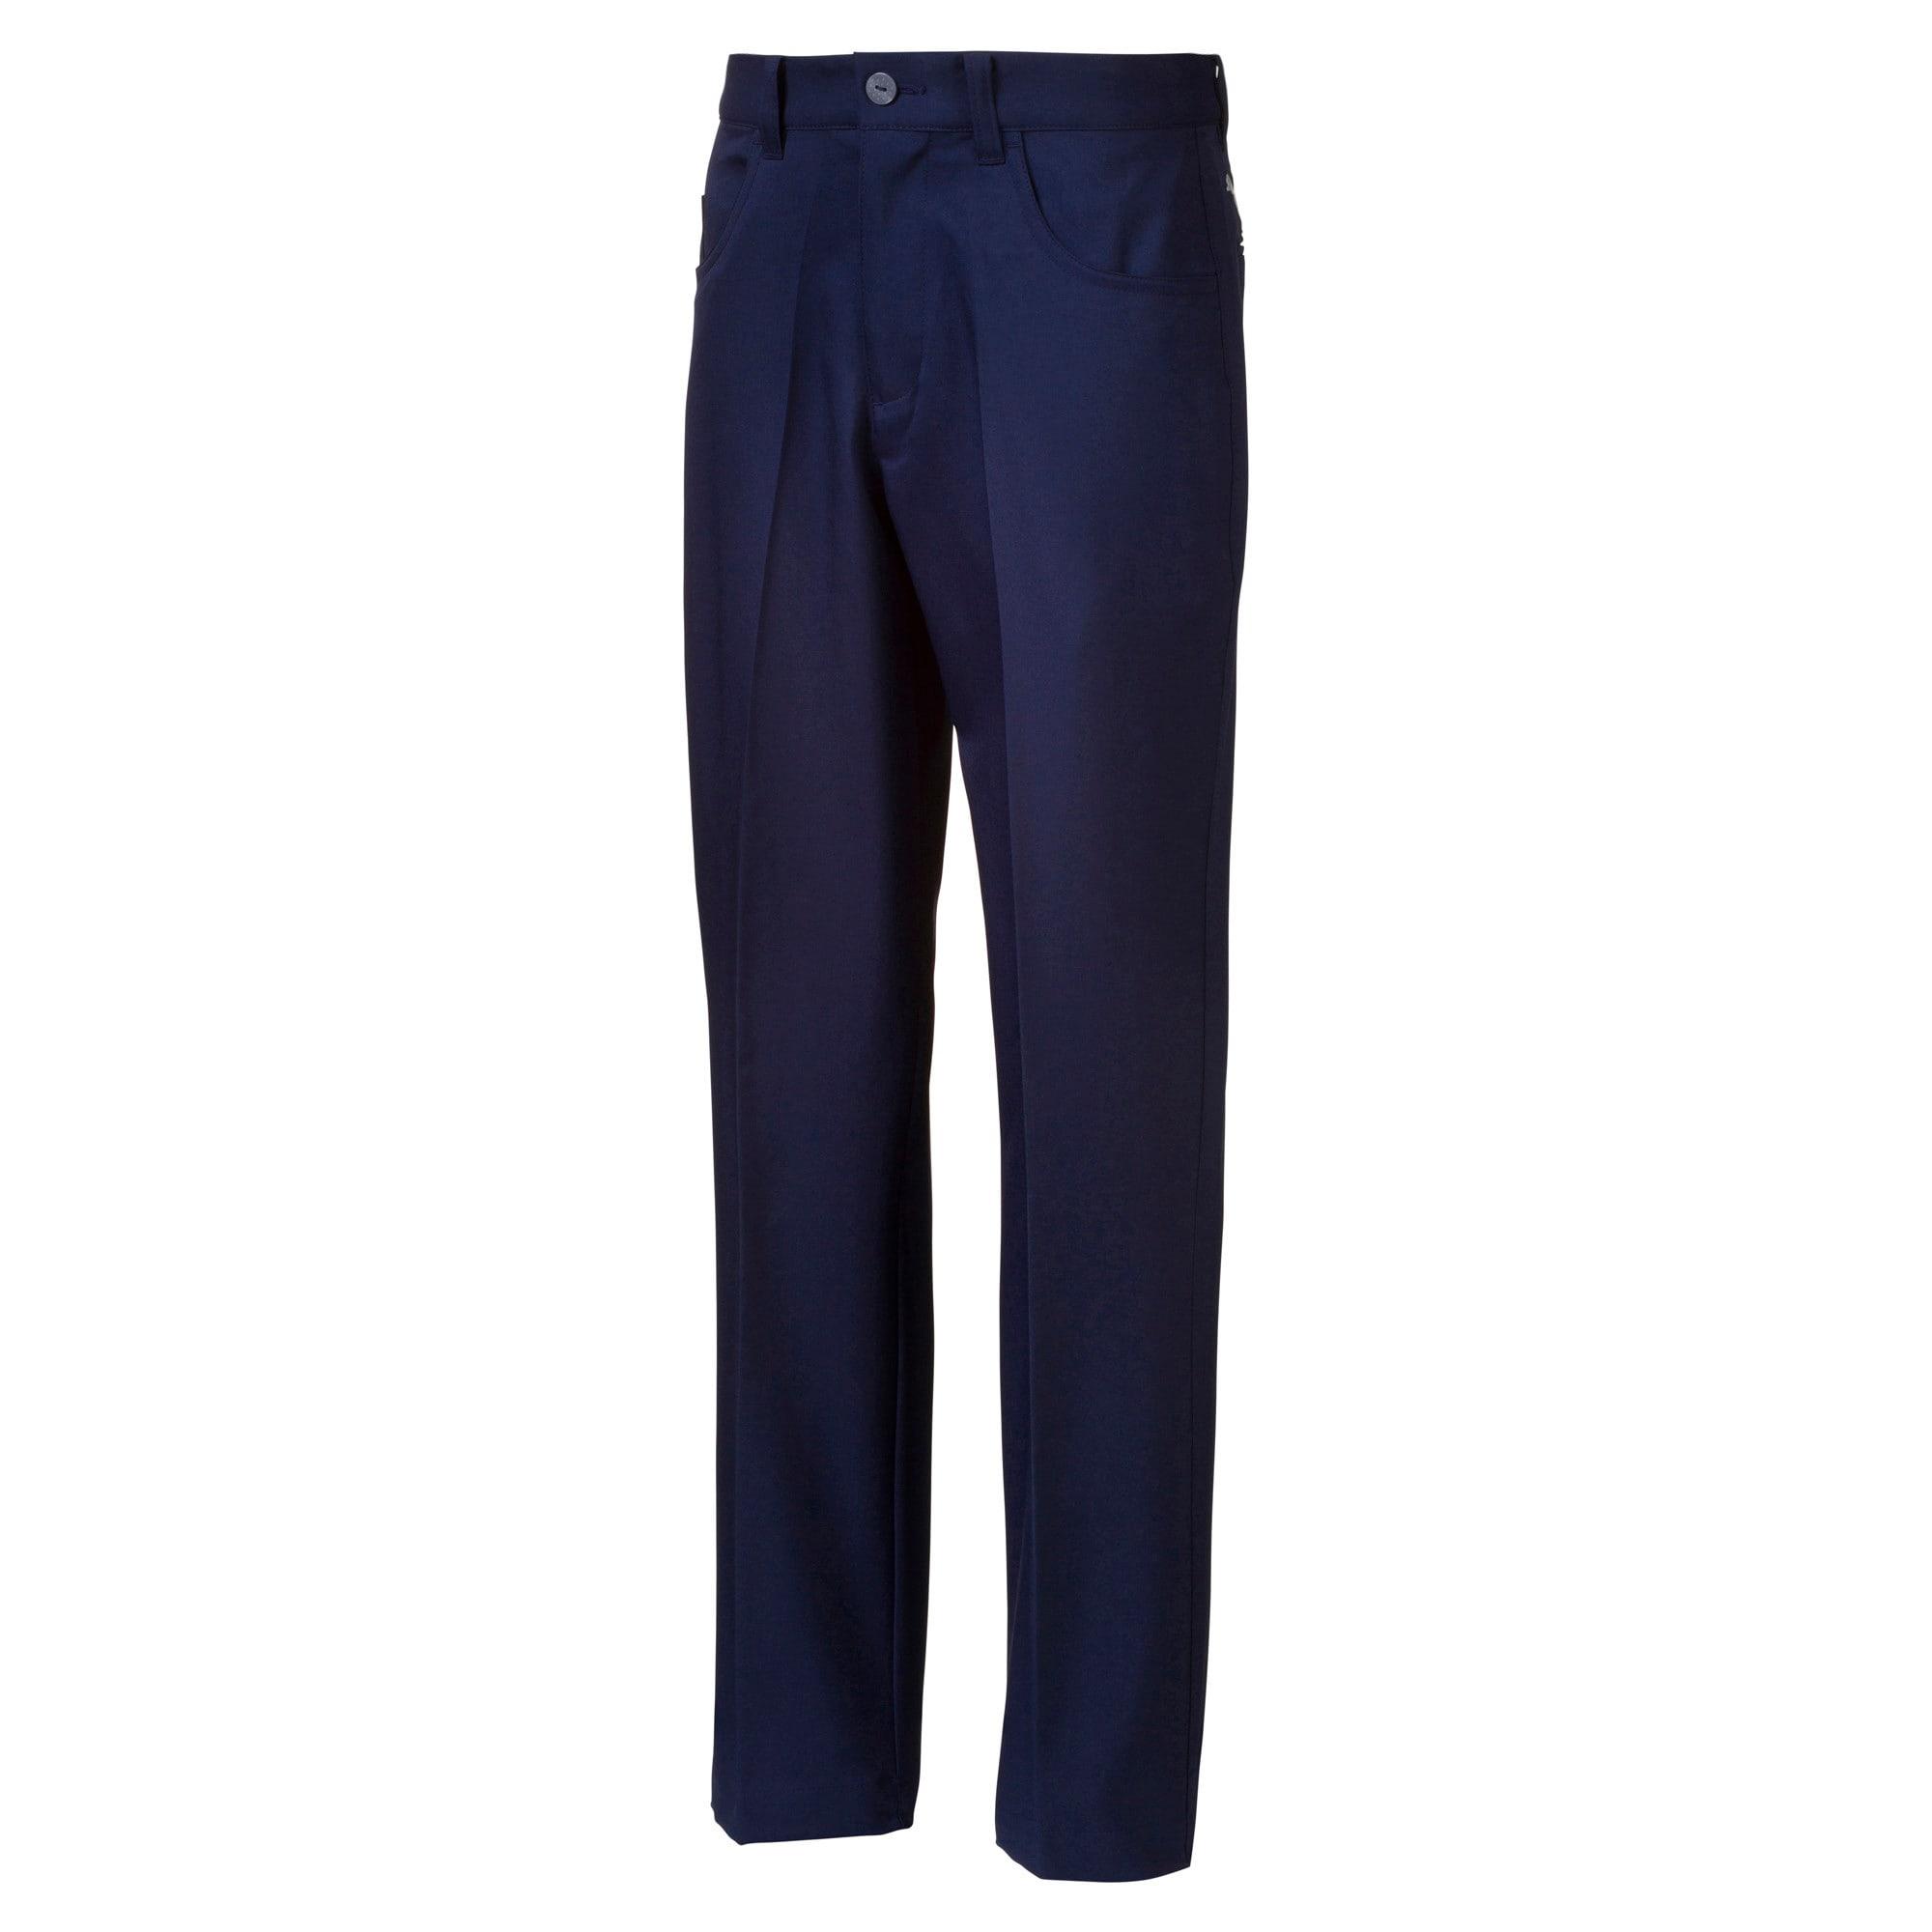 Thumbnail 1 of 5 Pocket Woven Boys' Golf Pants, Peacoat, medium